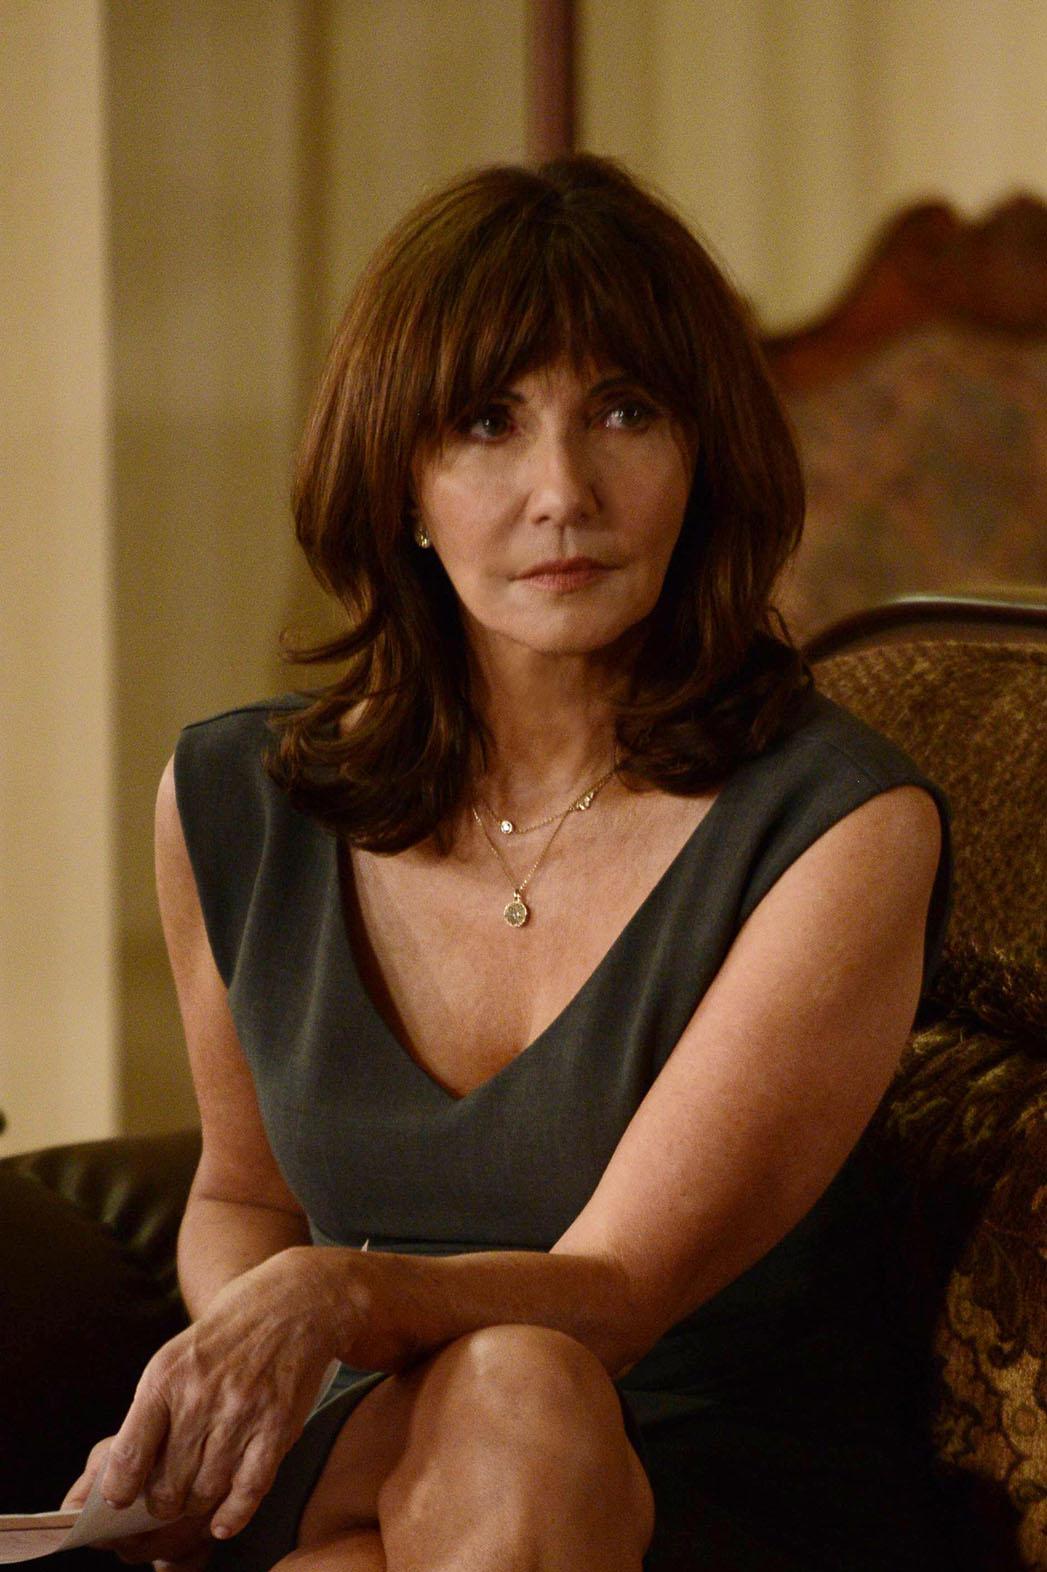 Justified S06E02 Still - P 2015